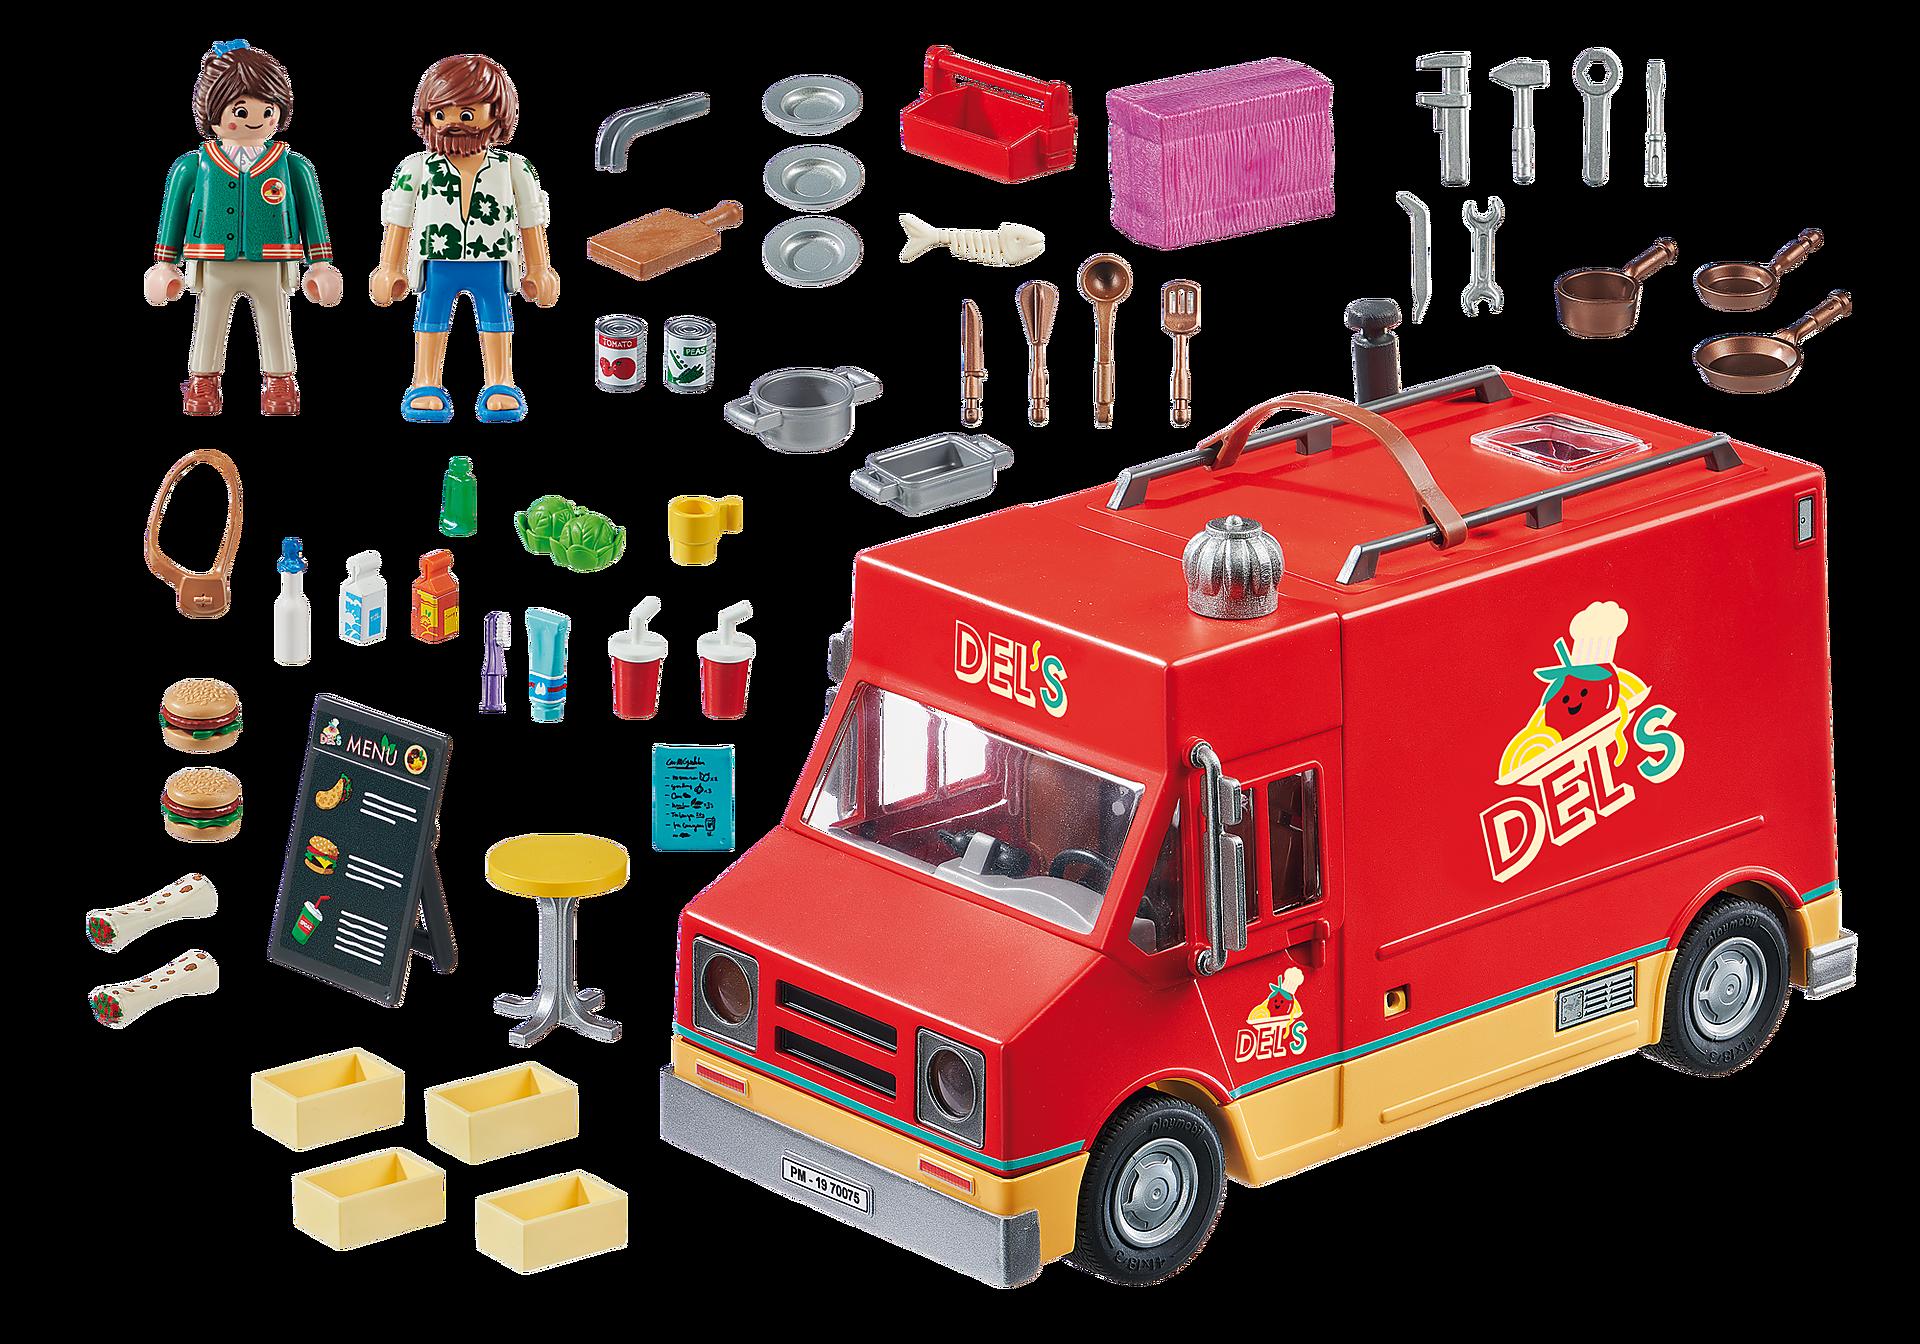 70075 PLAYMOBIL: THE MOVIE Food Truck de Del  zoom image3